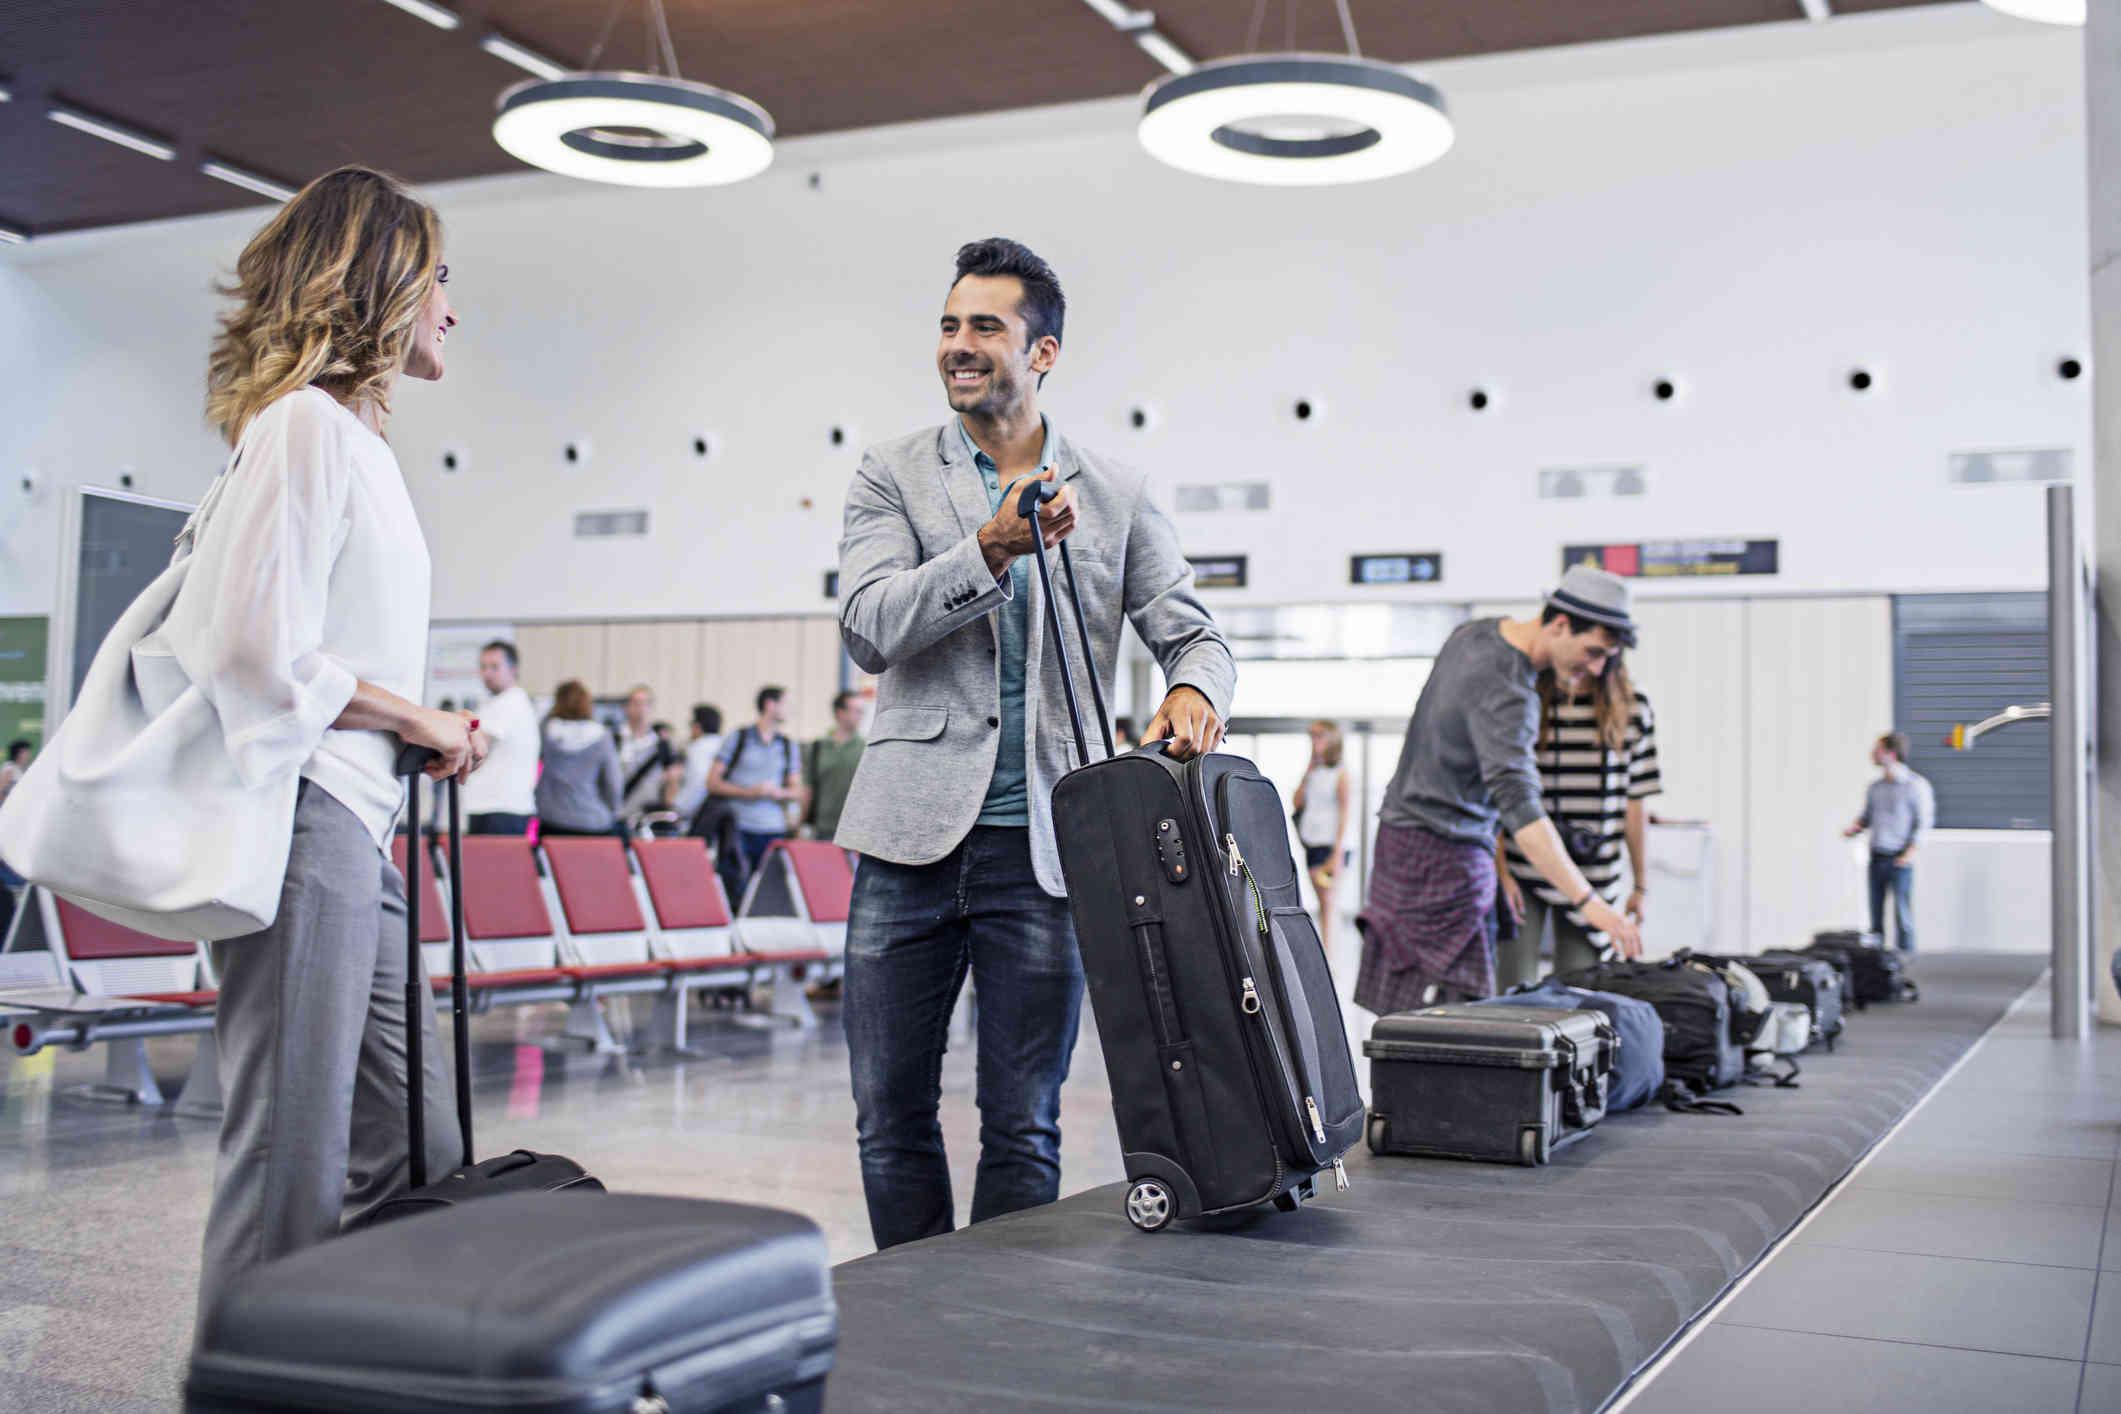 Roadblocks Grounding the Smart Baggage Handling Solutions Market